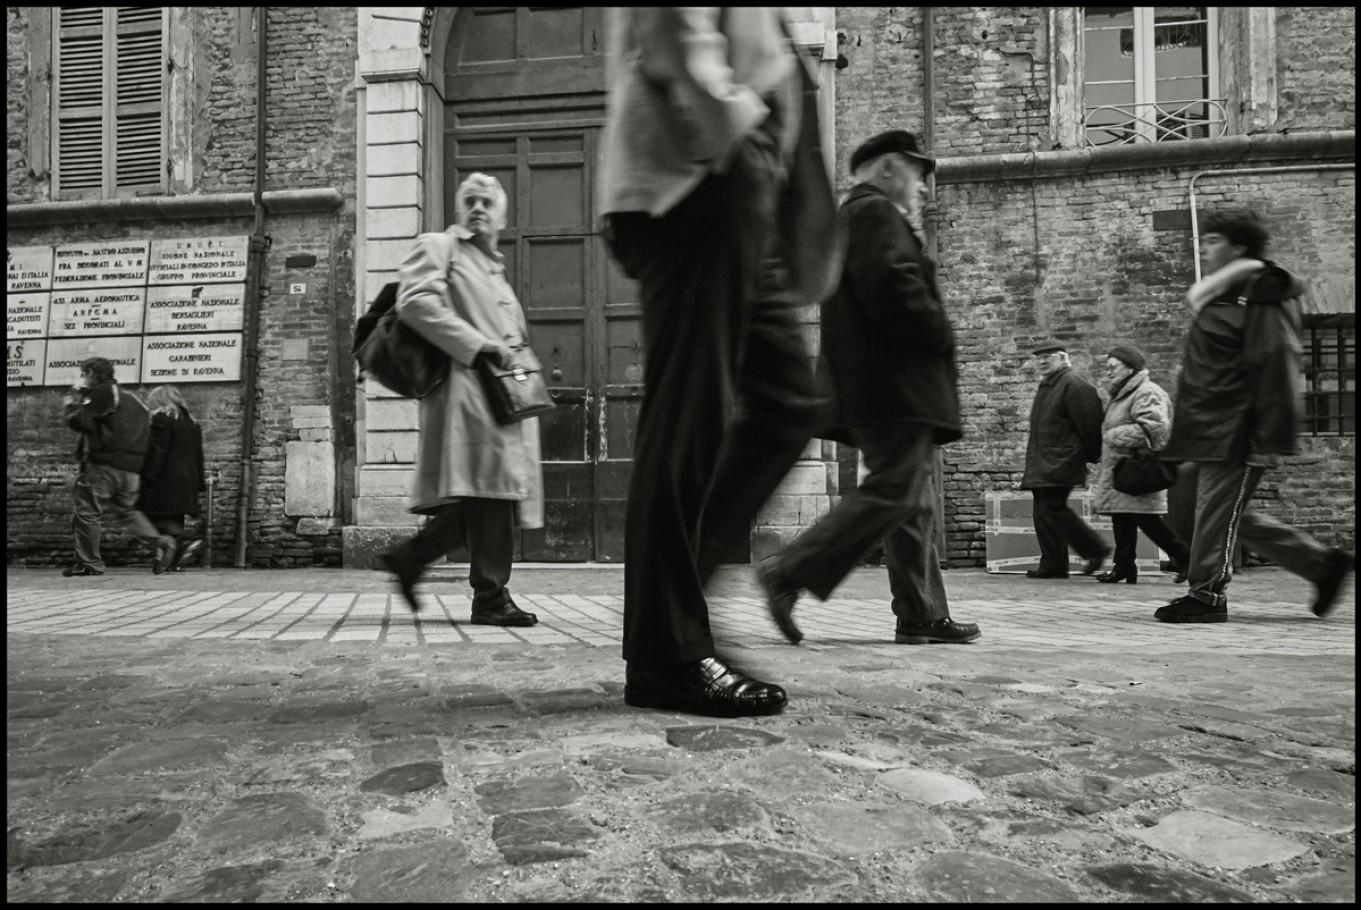 11 marzo 2005, via Cavour